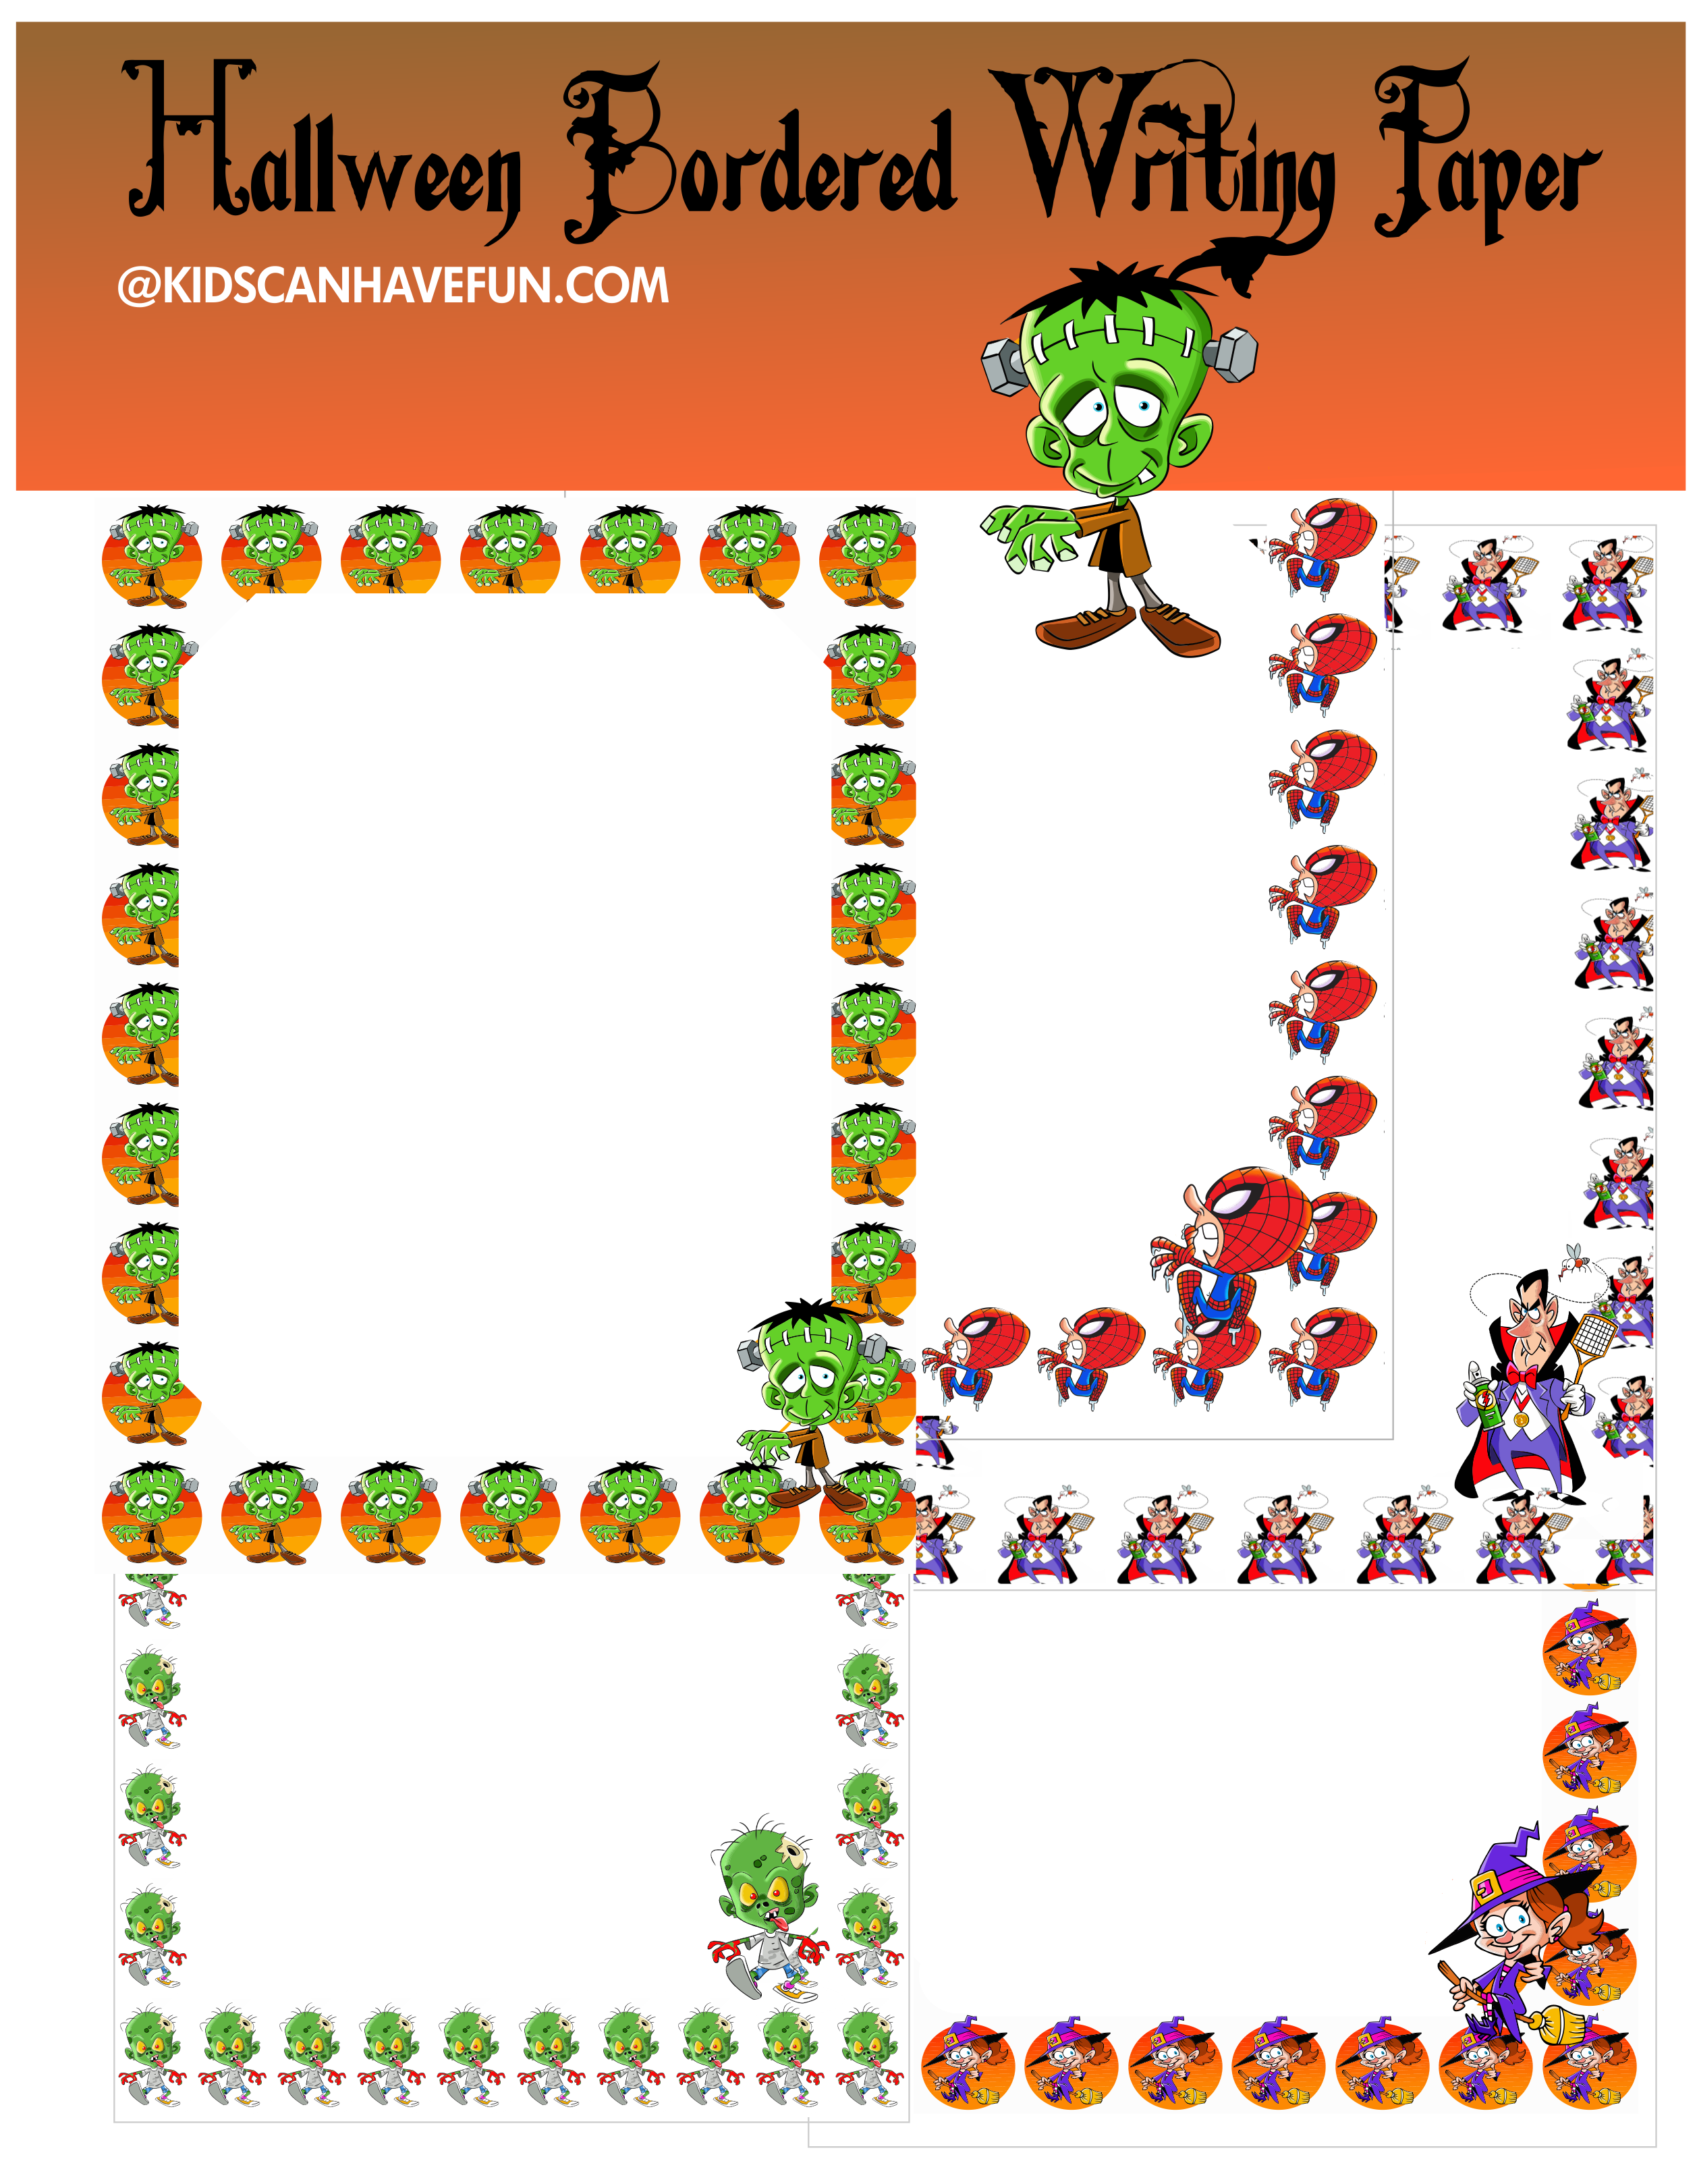 Pin By Kidscanhavefun On Halloween Activities Crafts